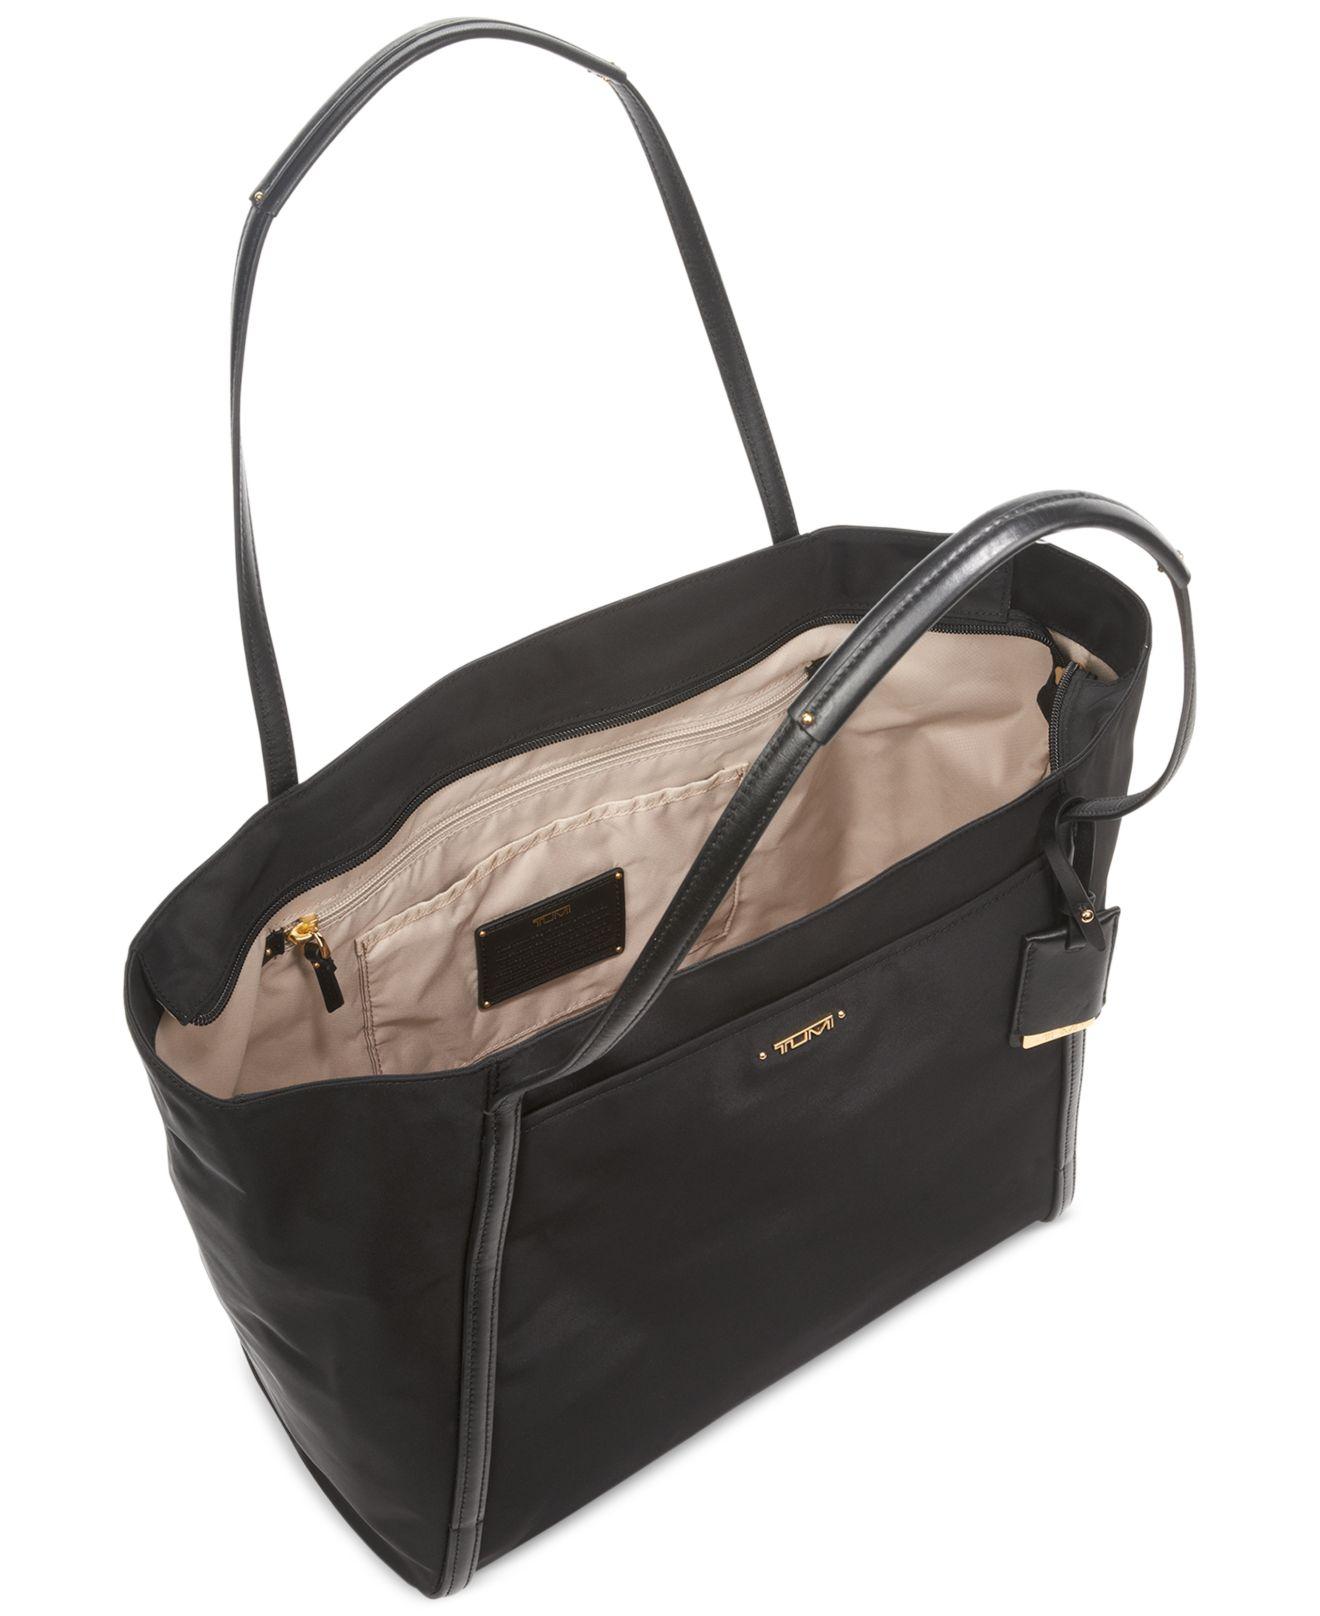 Tumi Voyageur Leather Carolina Tote (Black) Tote Handbags iF1eQt